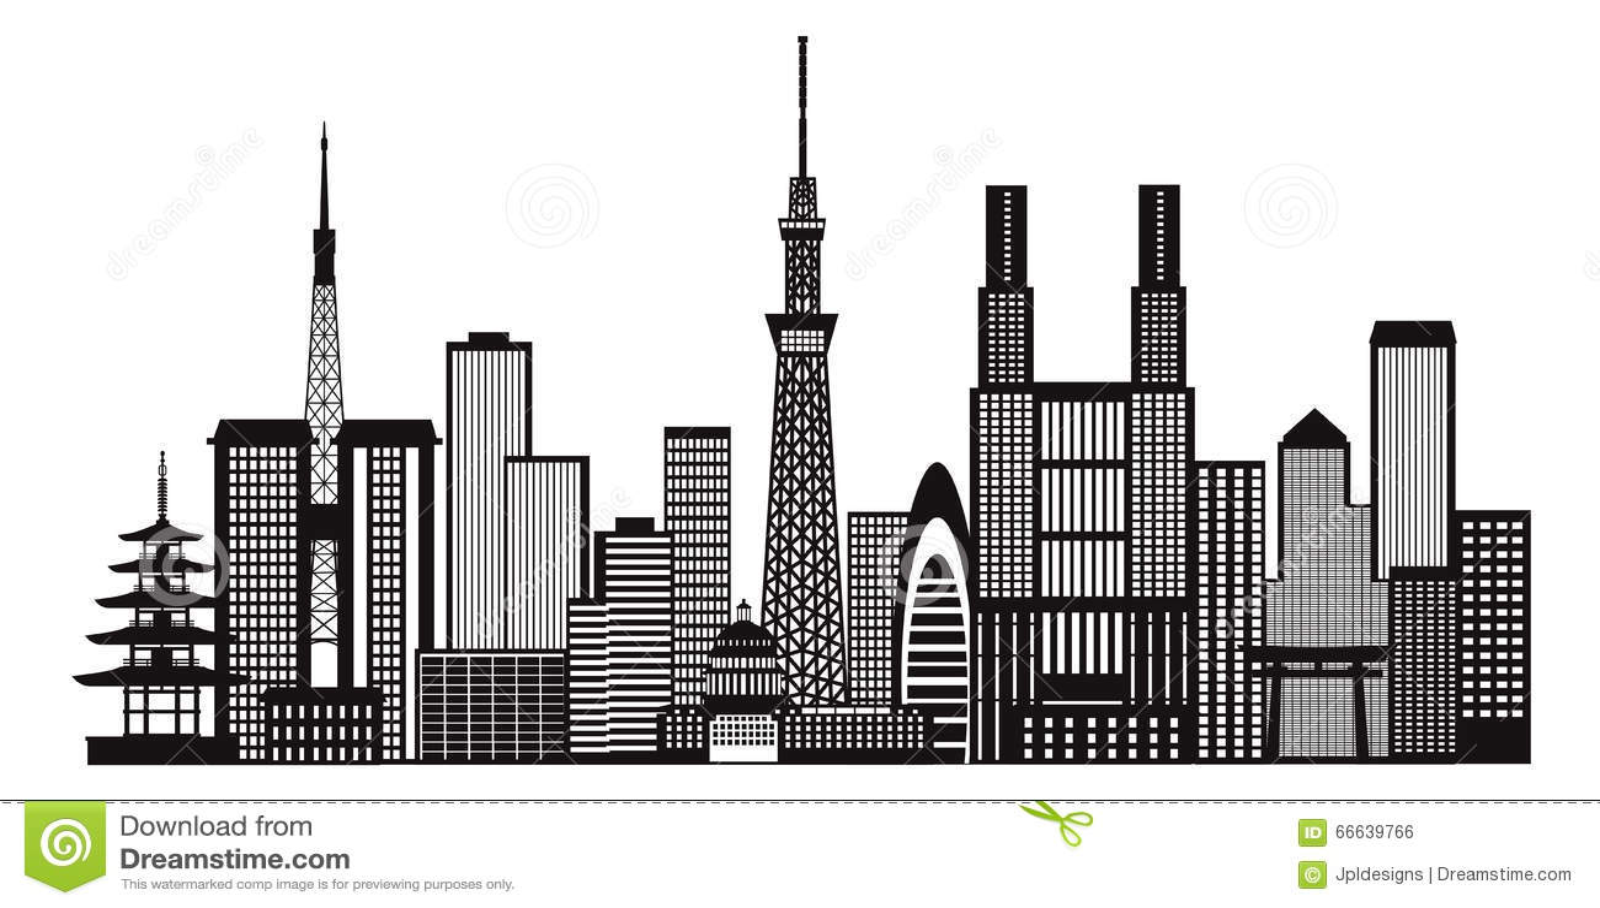 Tokyo City Skyline Black And White Illustration Royalty Free Stock Image